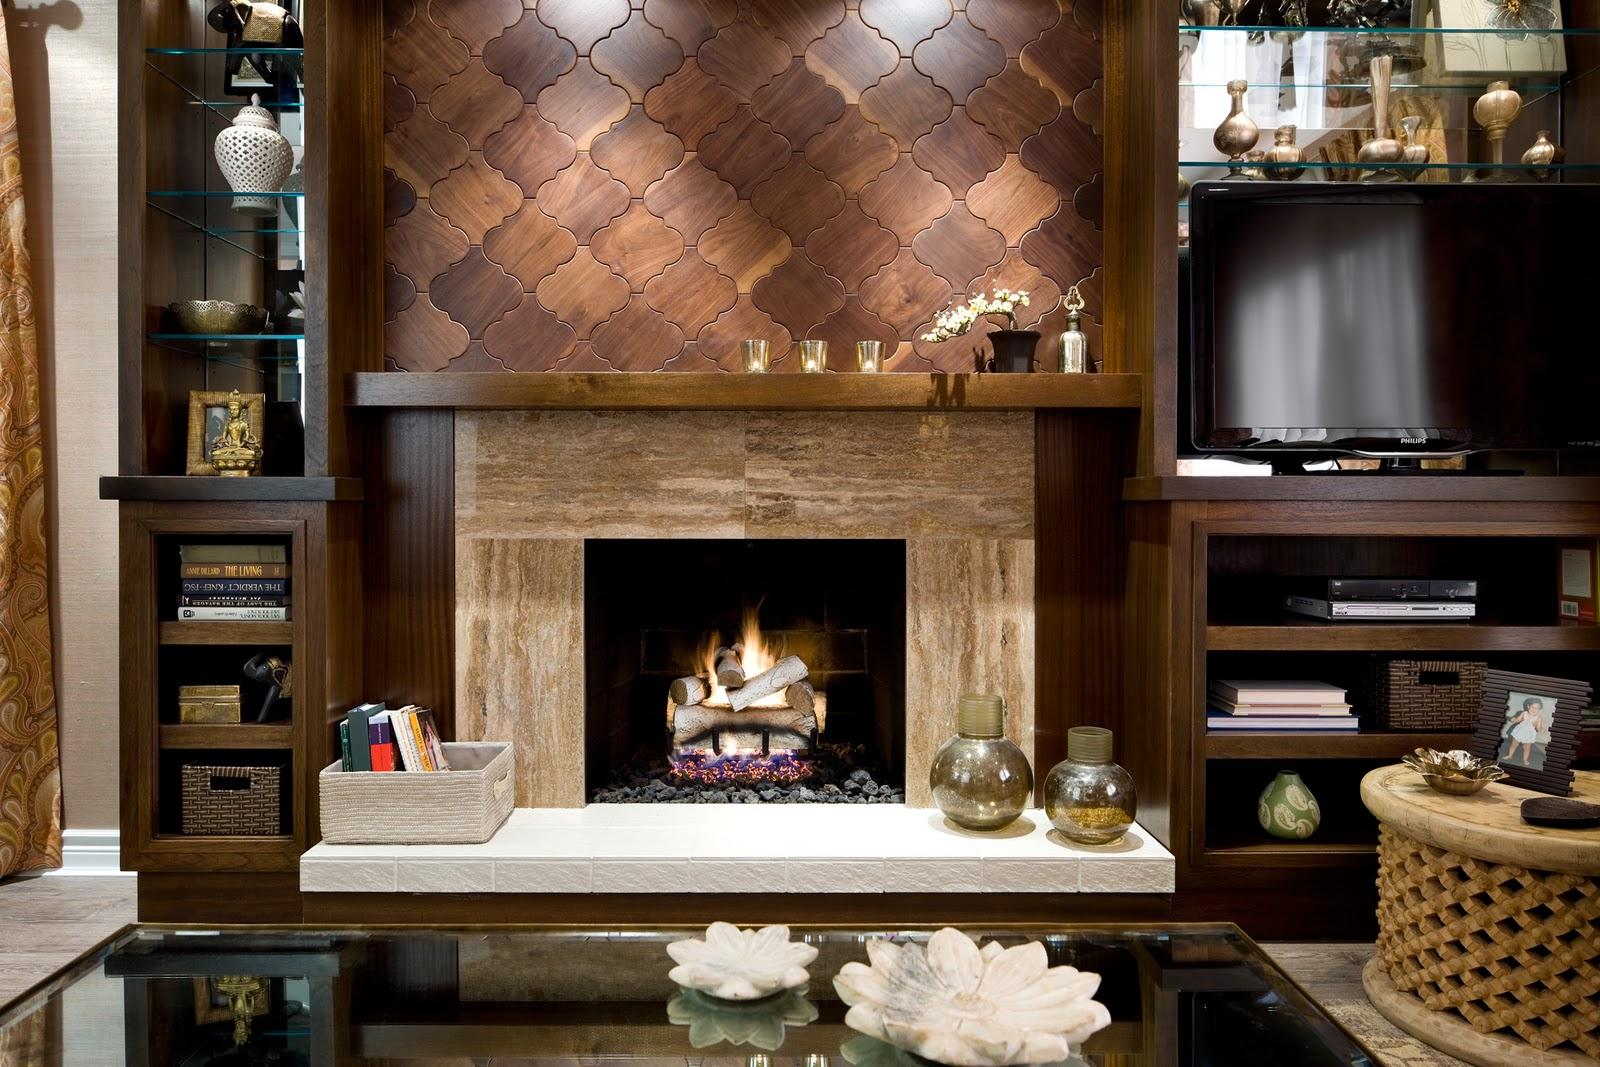 8x36 White Woodridge Honed Limestone Tiles Fireplace surround